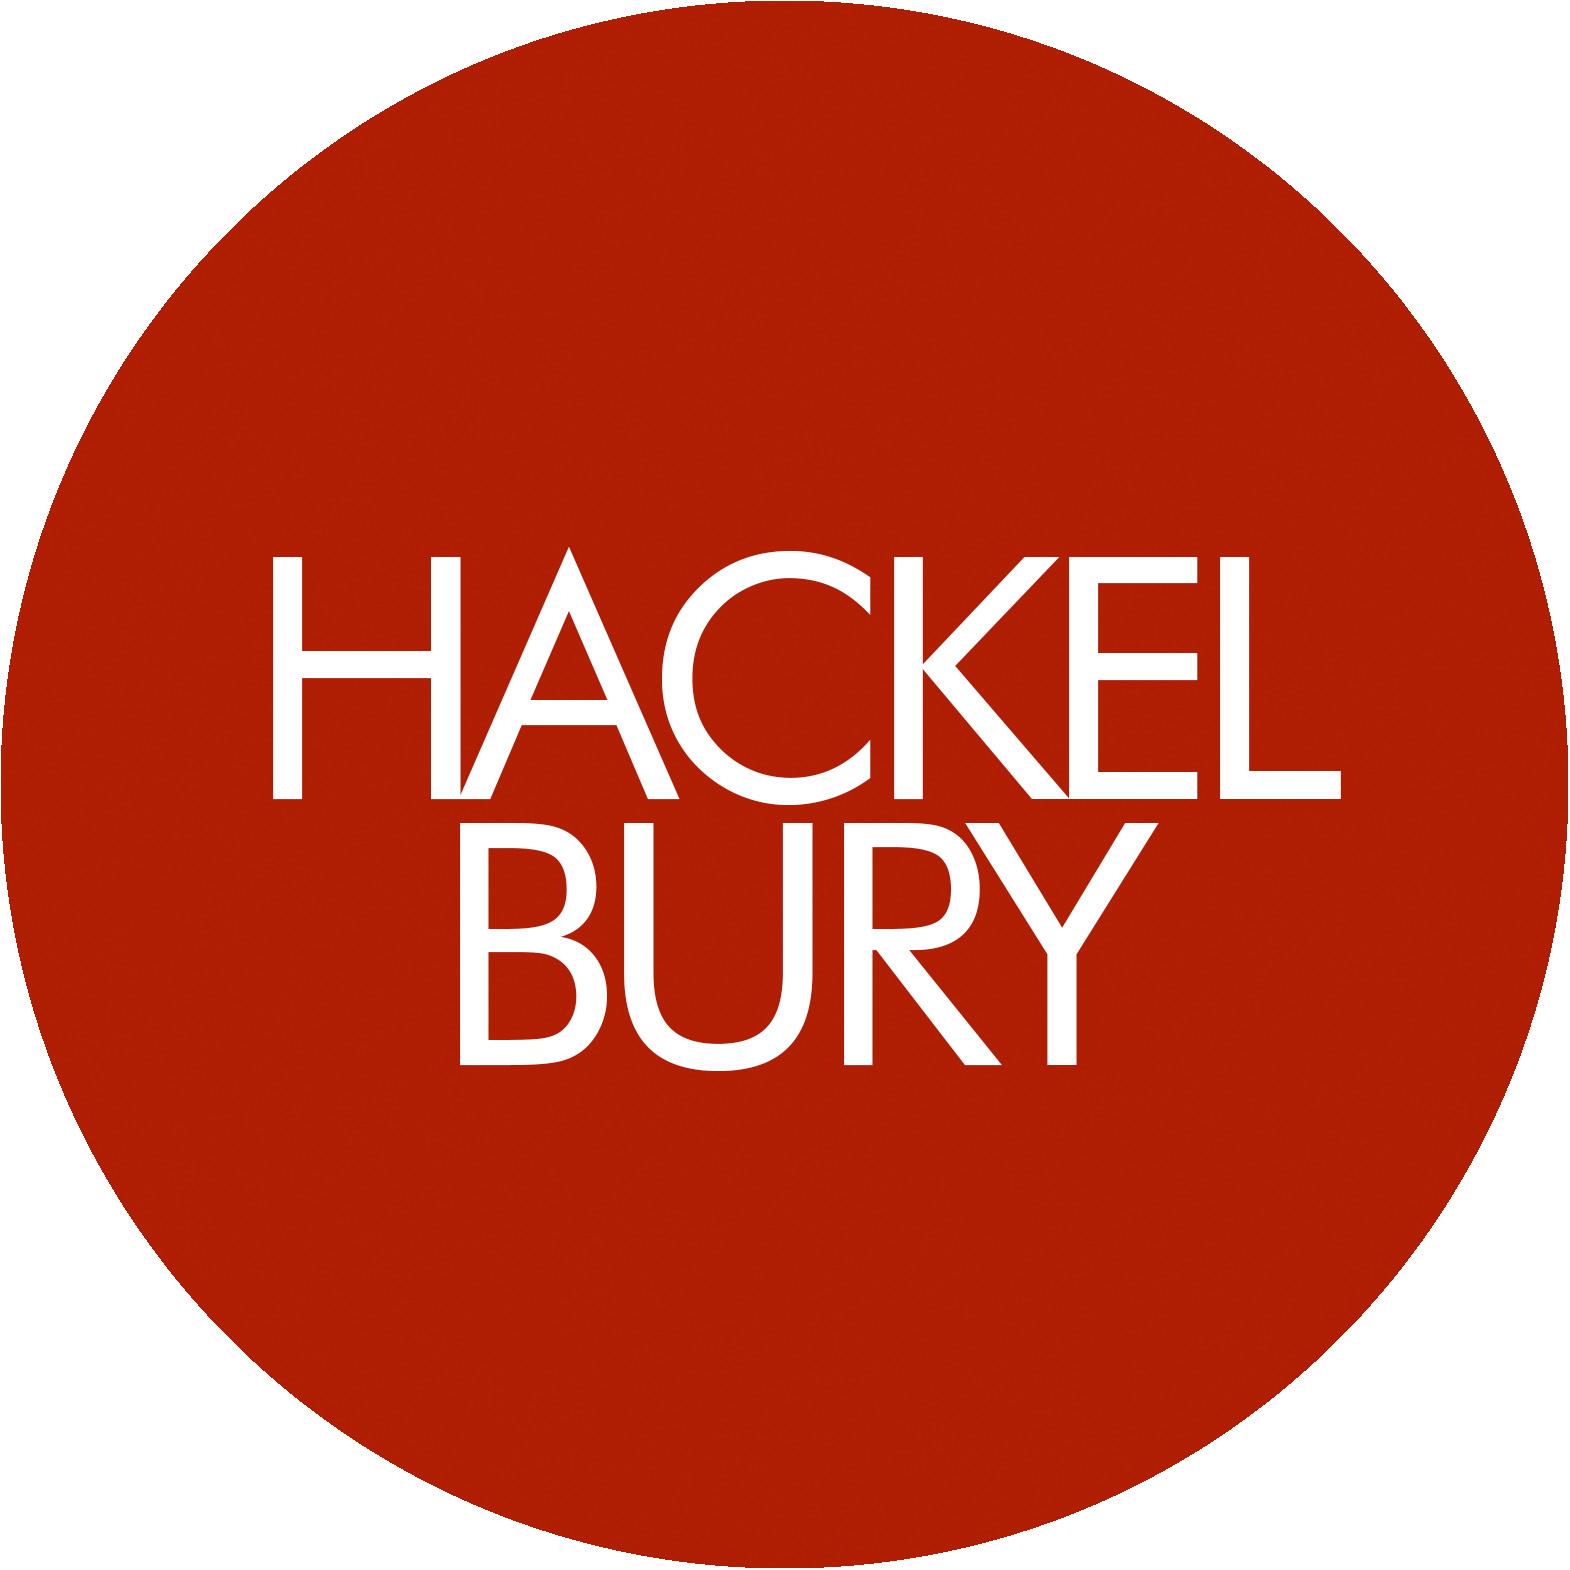 HackelBury Fine Art